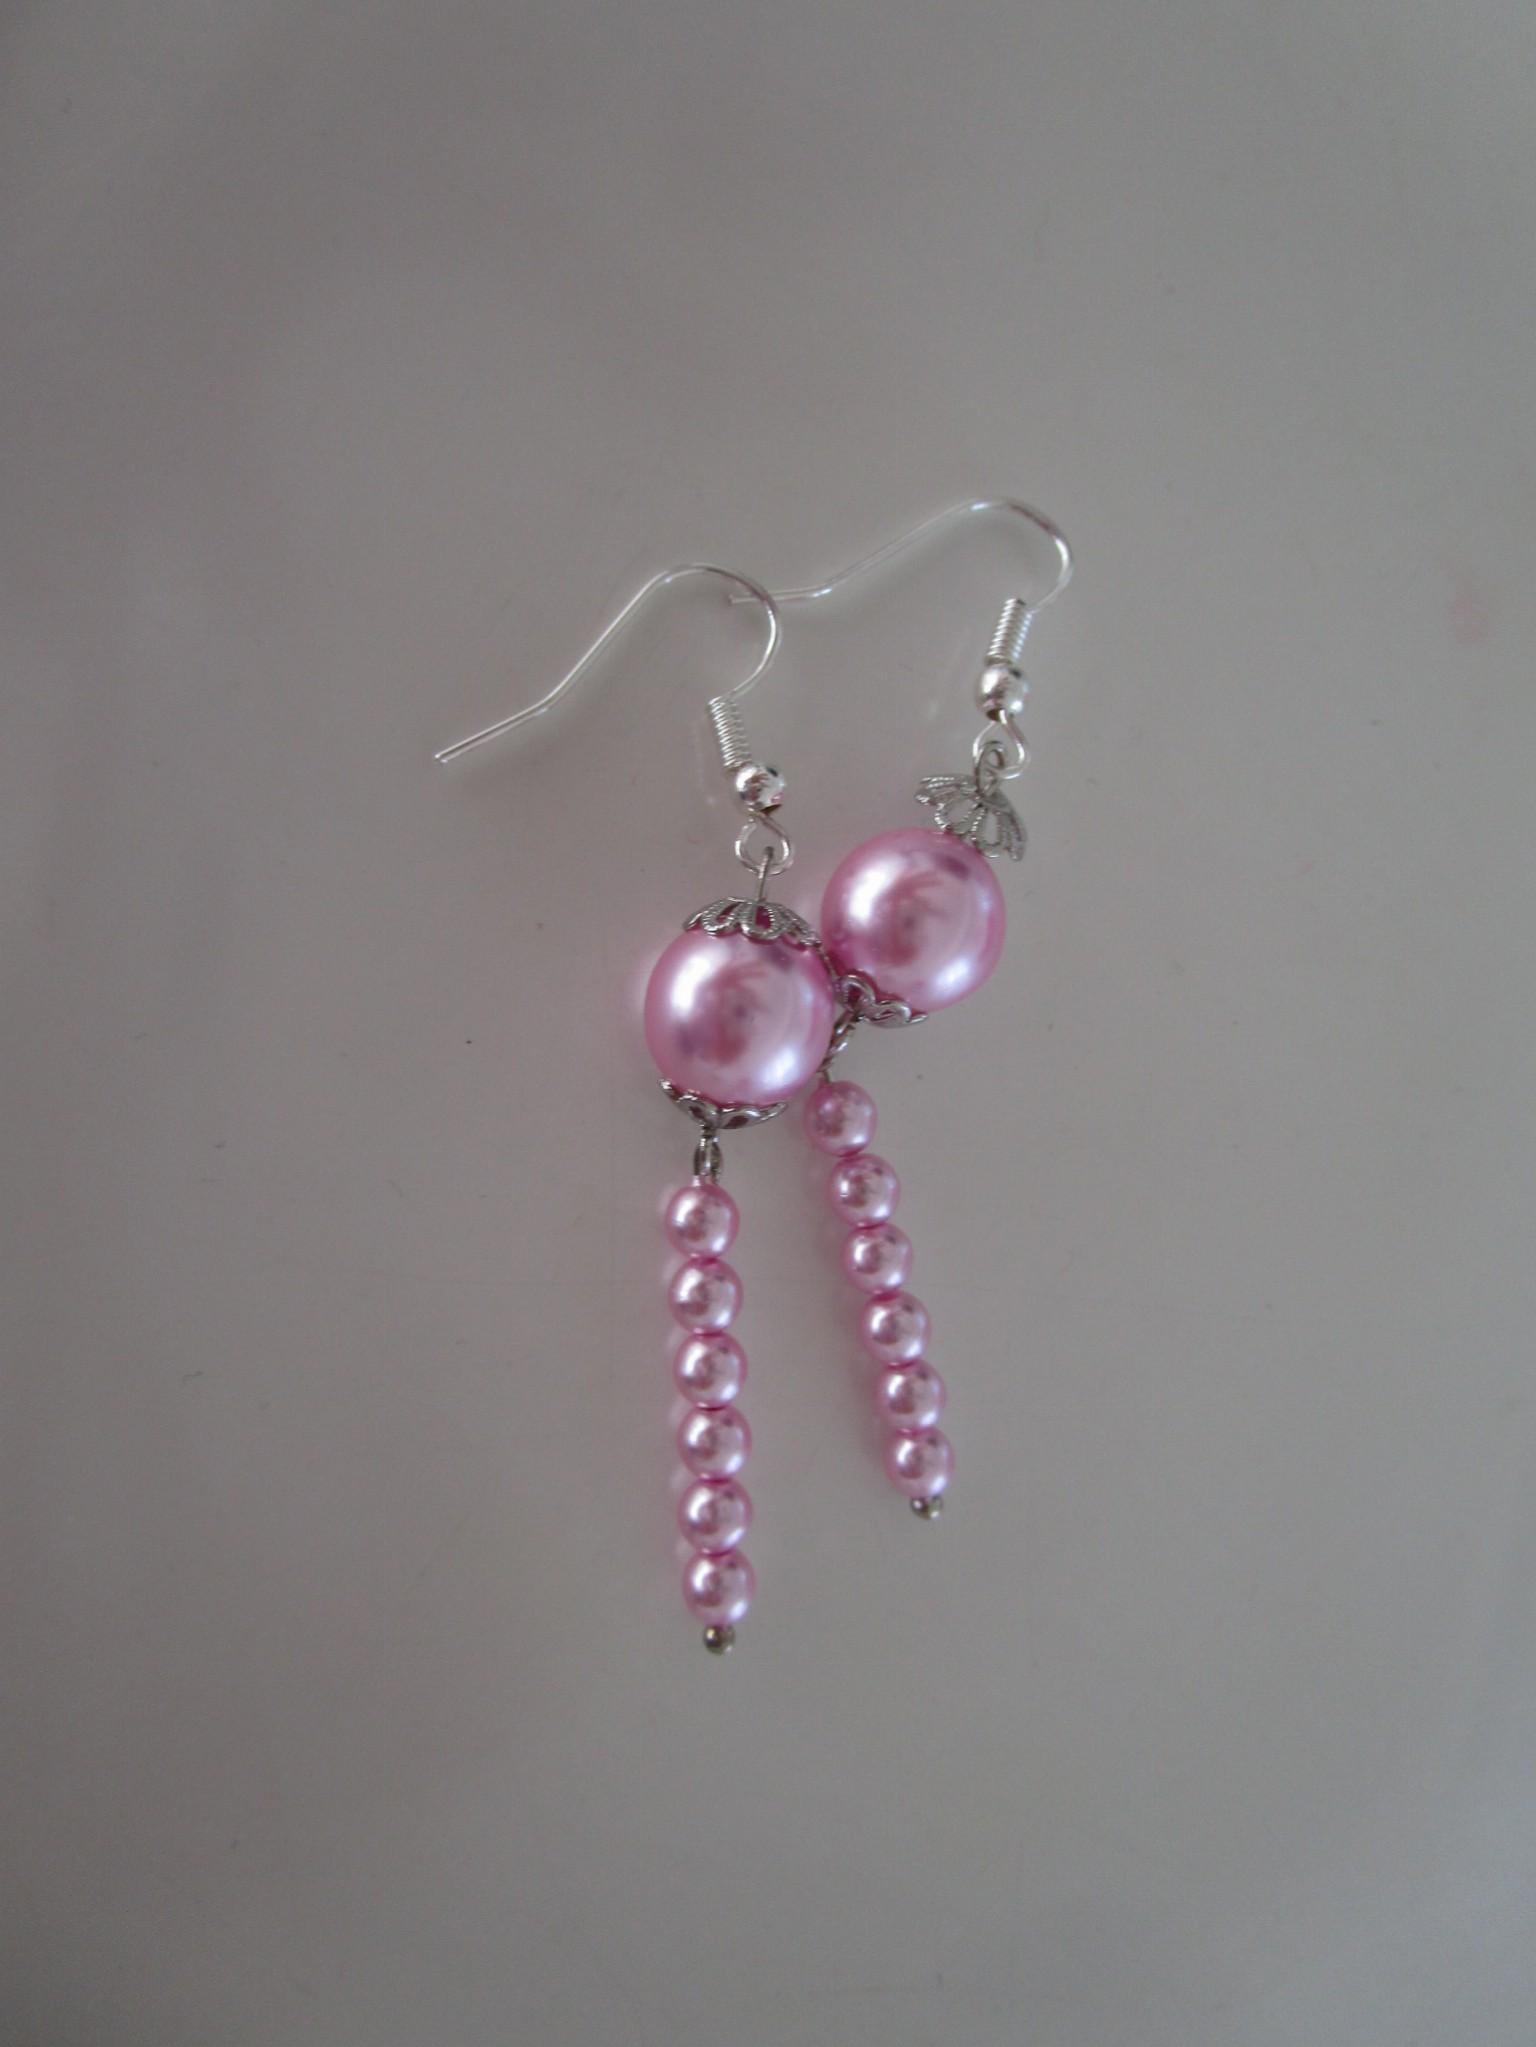 Tuto boucles d 39 oreilles papillon en perles de rocaille - Tuto boucle d oreille perle ...